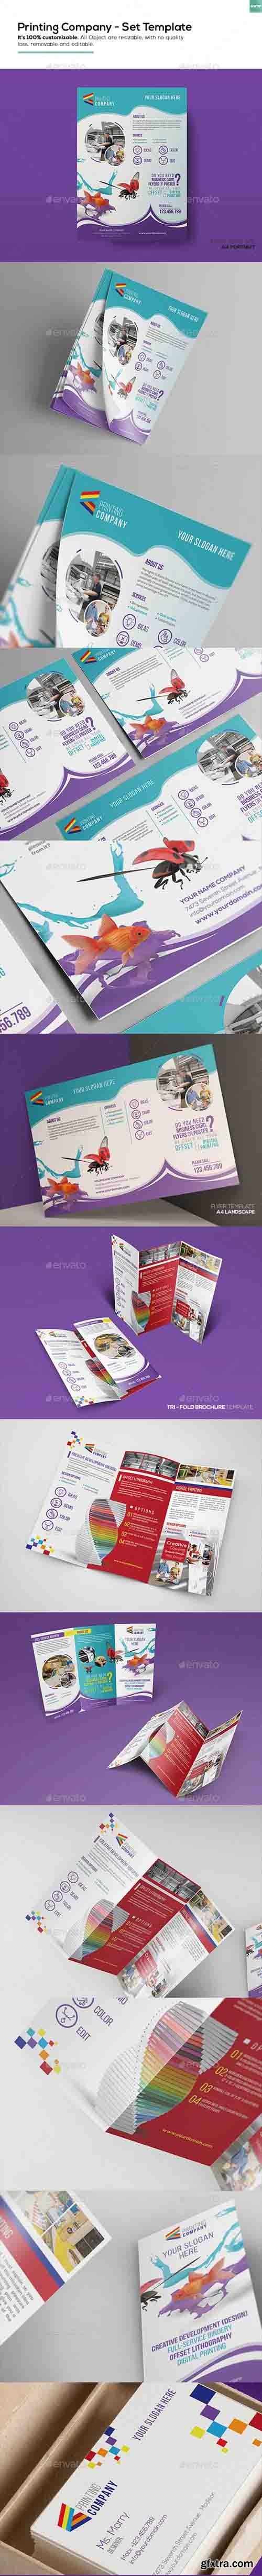 GR - Printing Company - Set Template 15562885